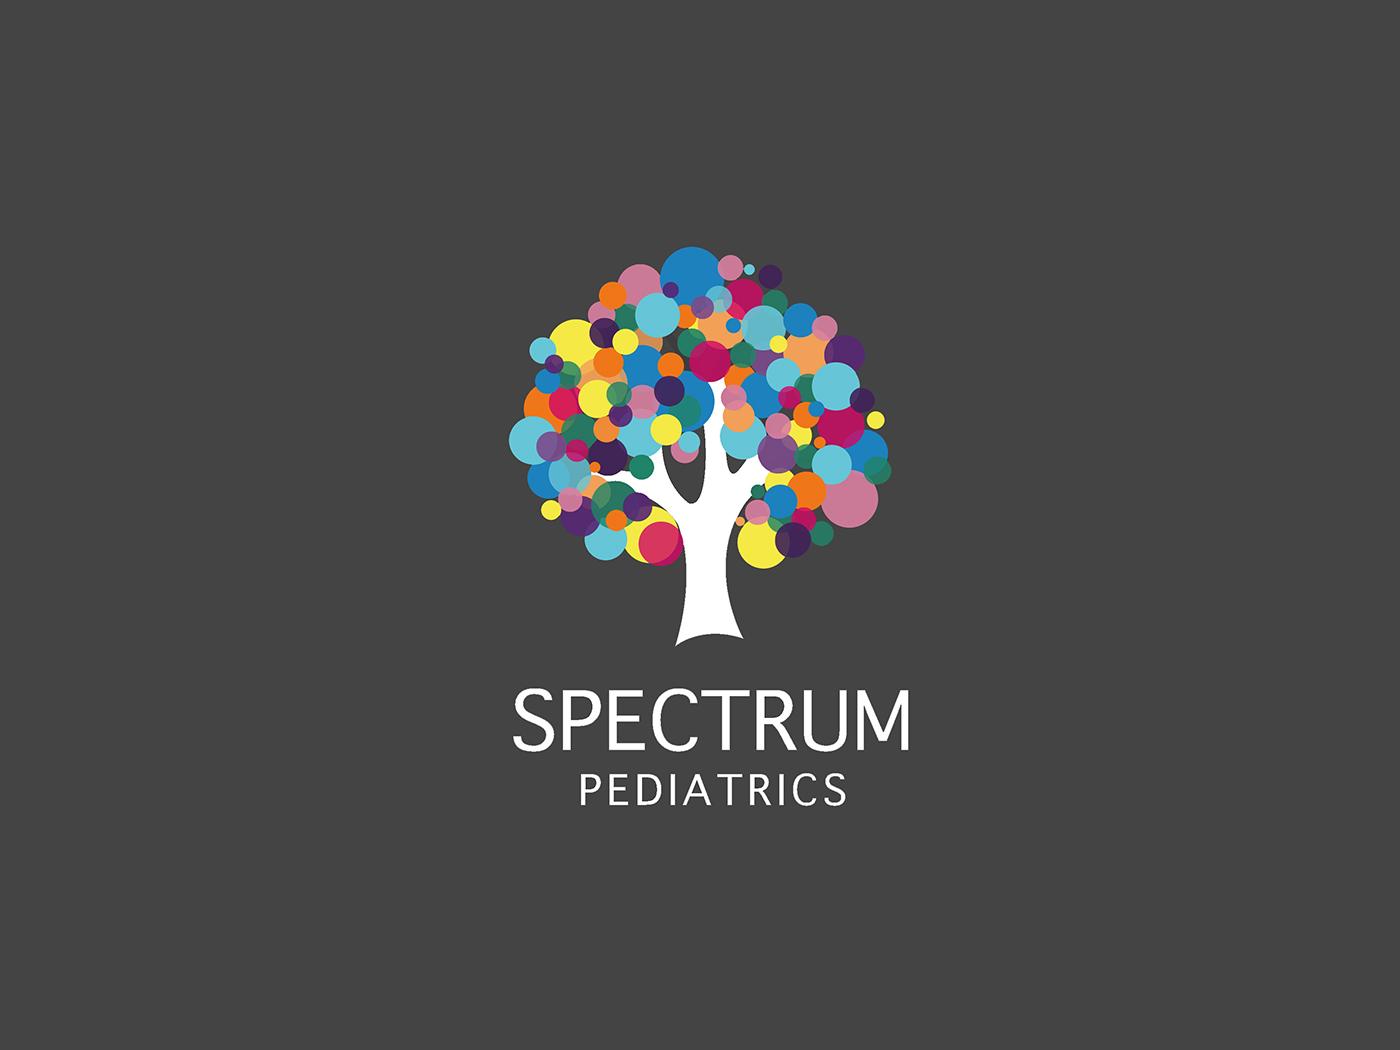 Brand Identity work for Spectrum pediatrics